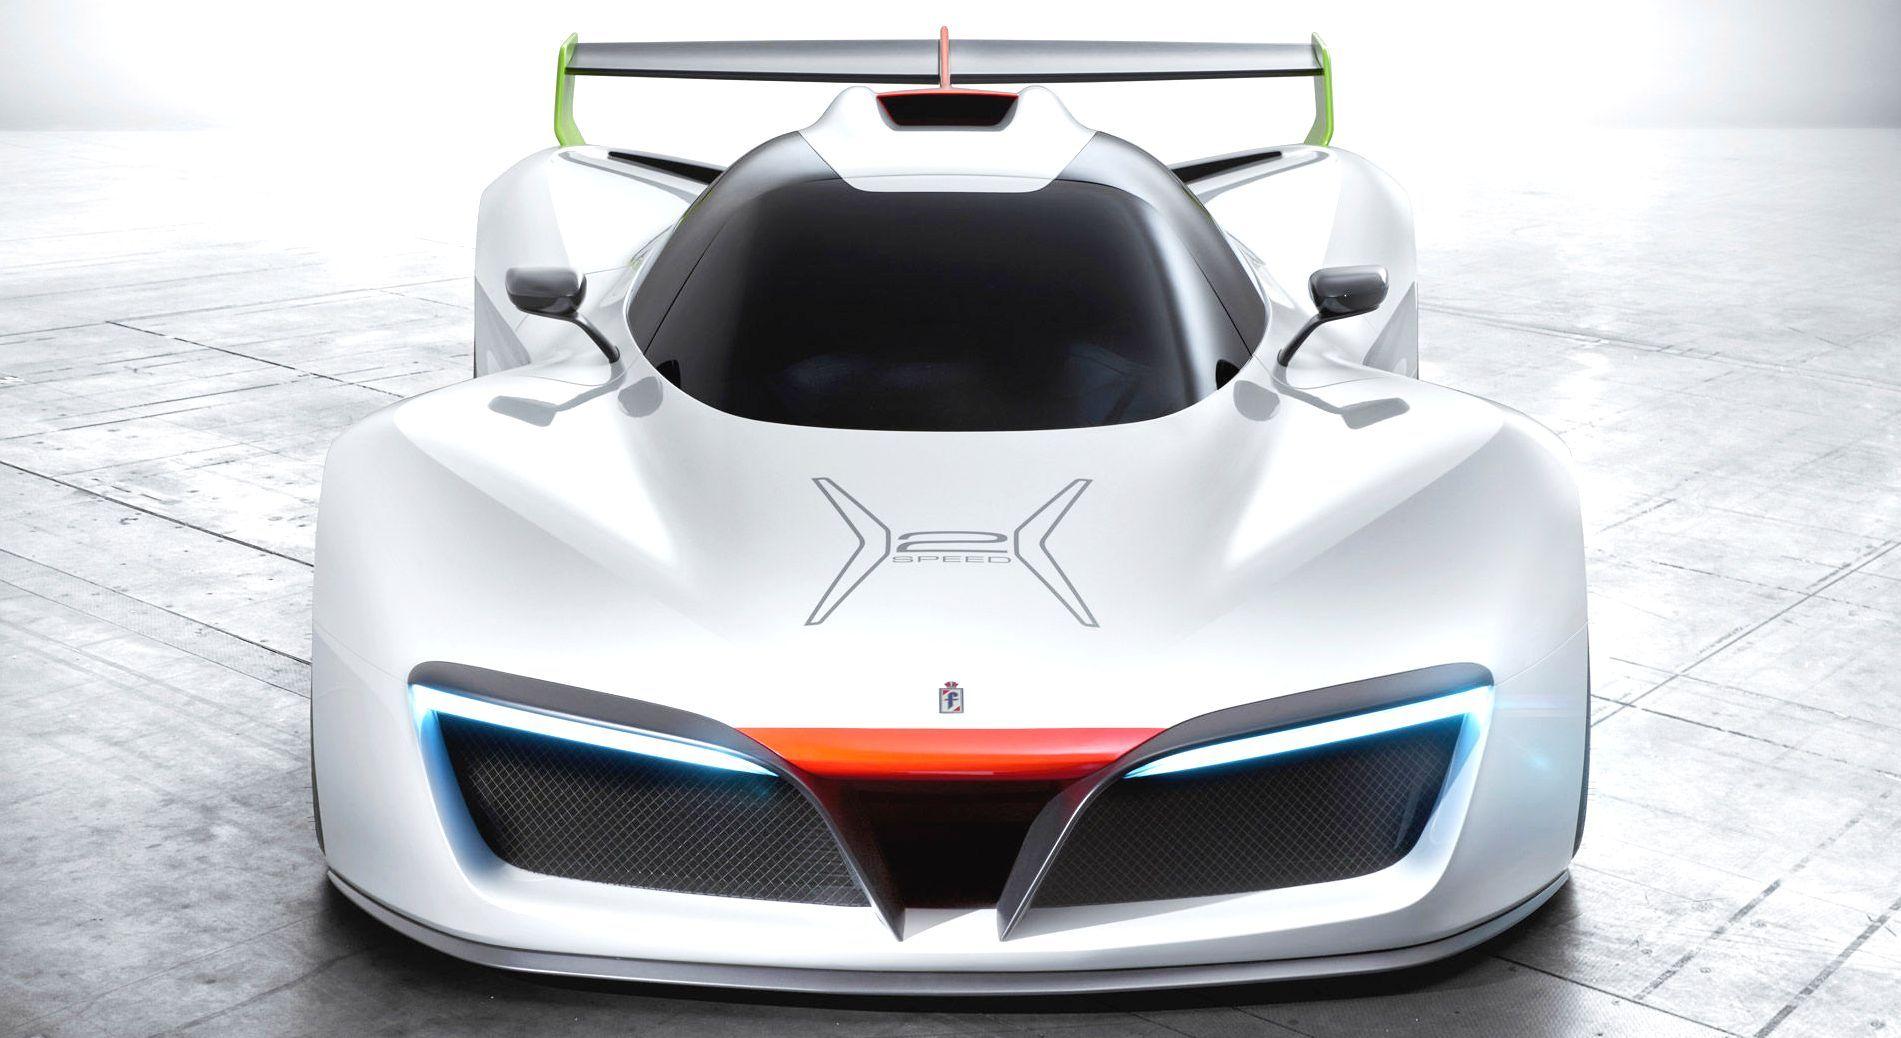 Pininfarina H2 hydrogen powered sports car concept Super